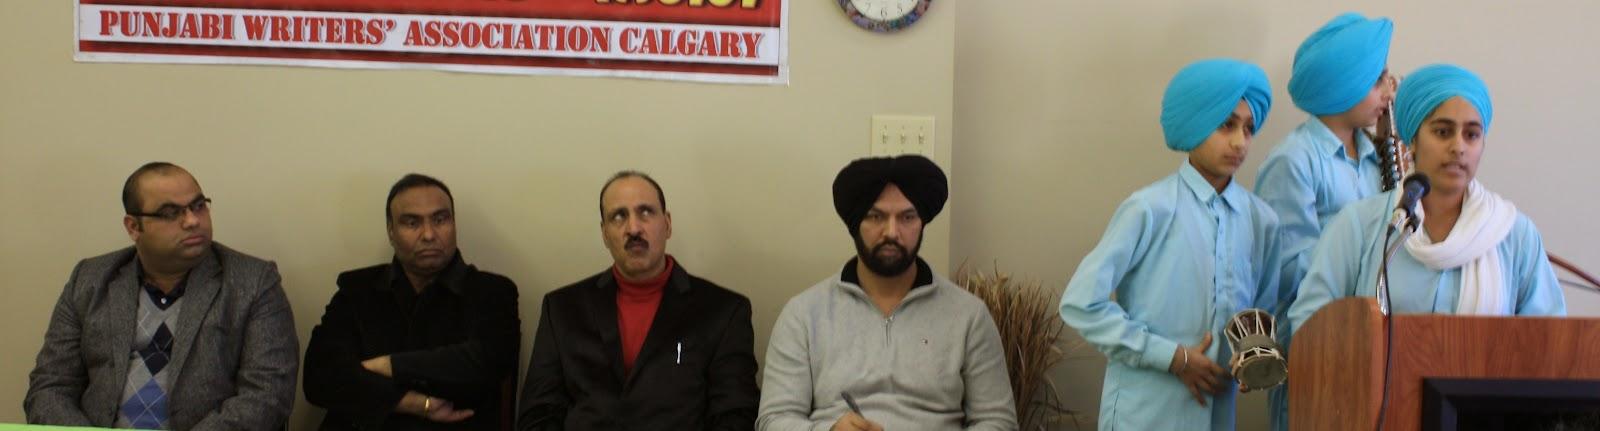 Children Singing Kavishari during the meeting of Punjabi Writers' Association, Calgary